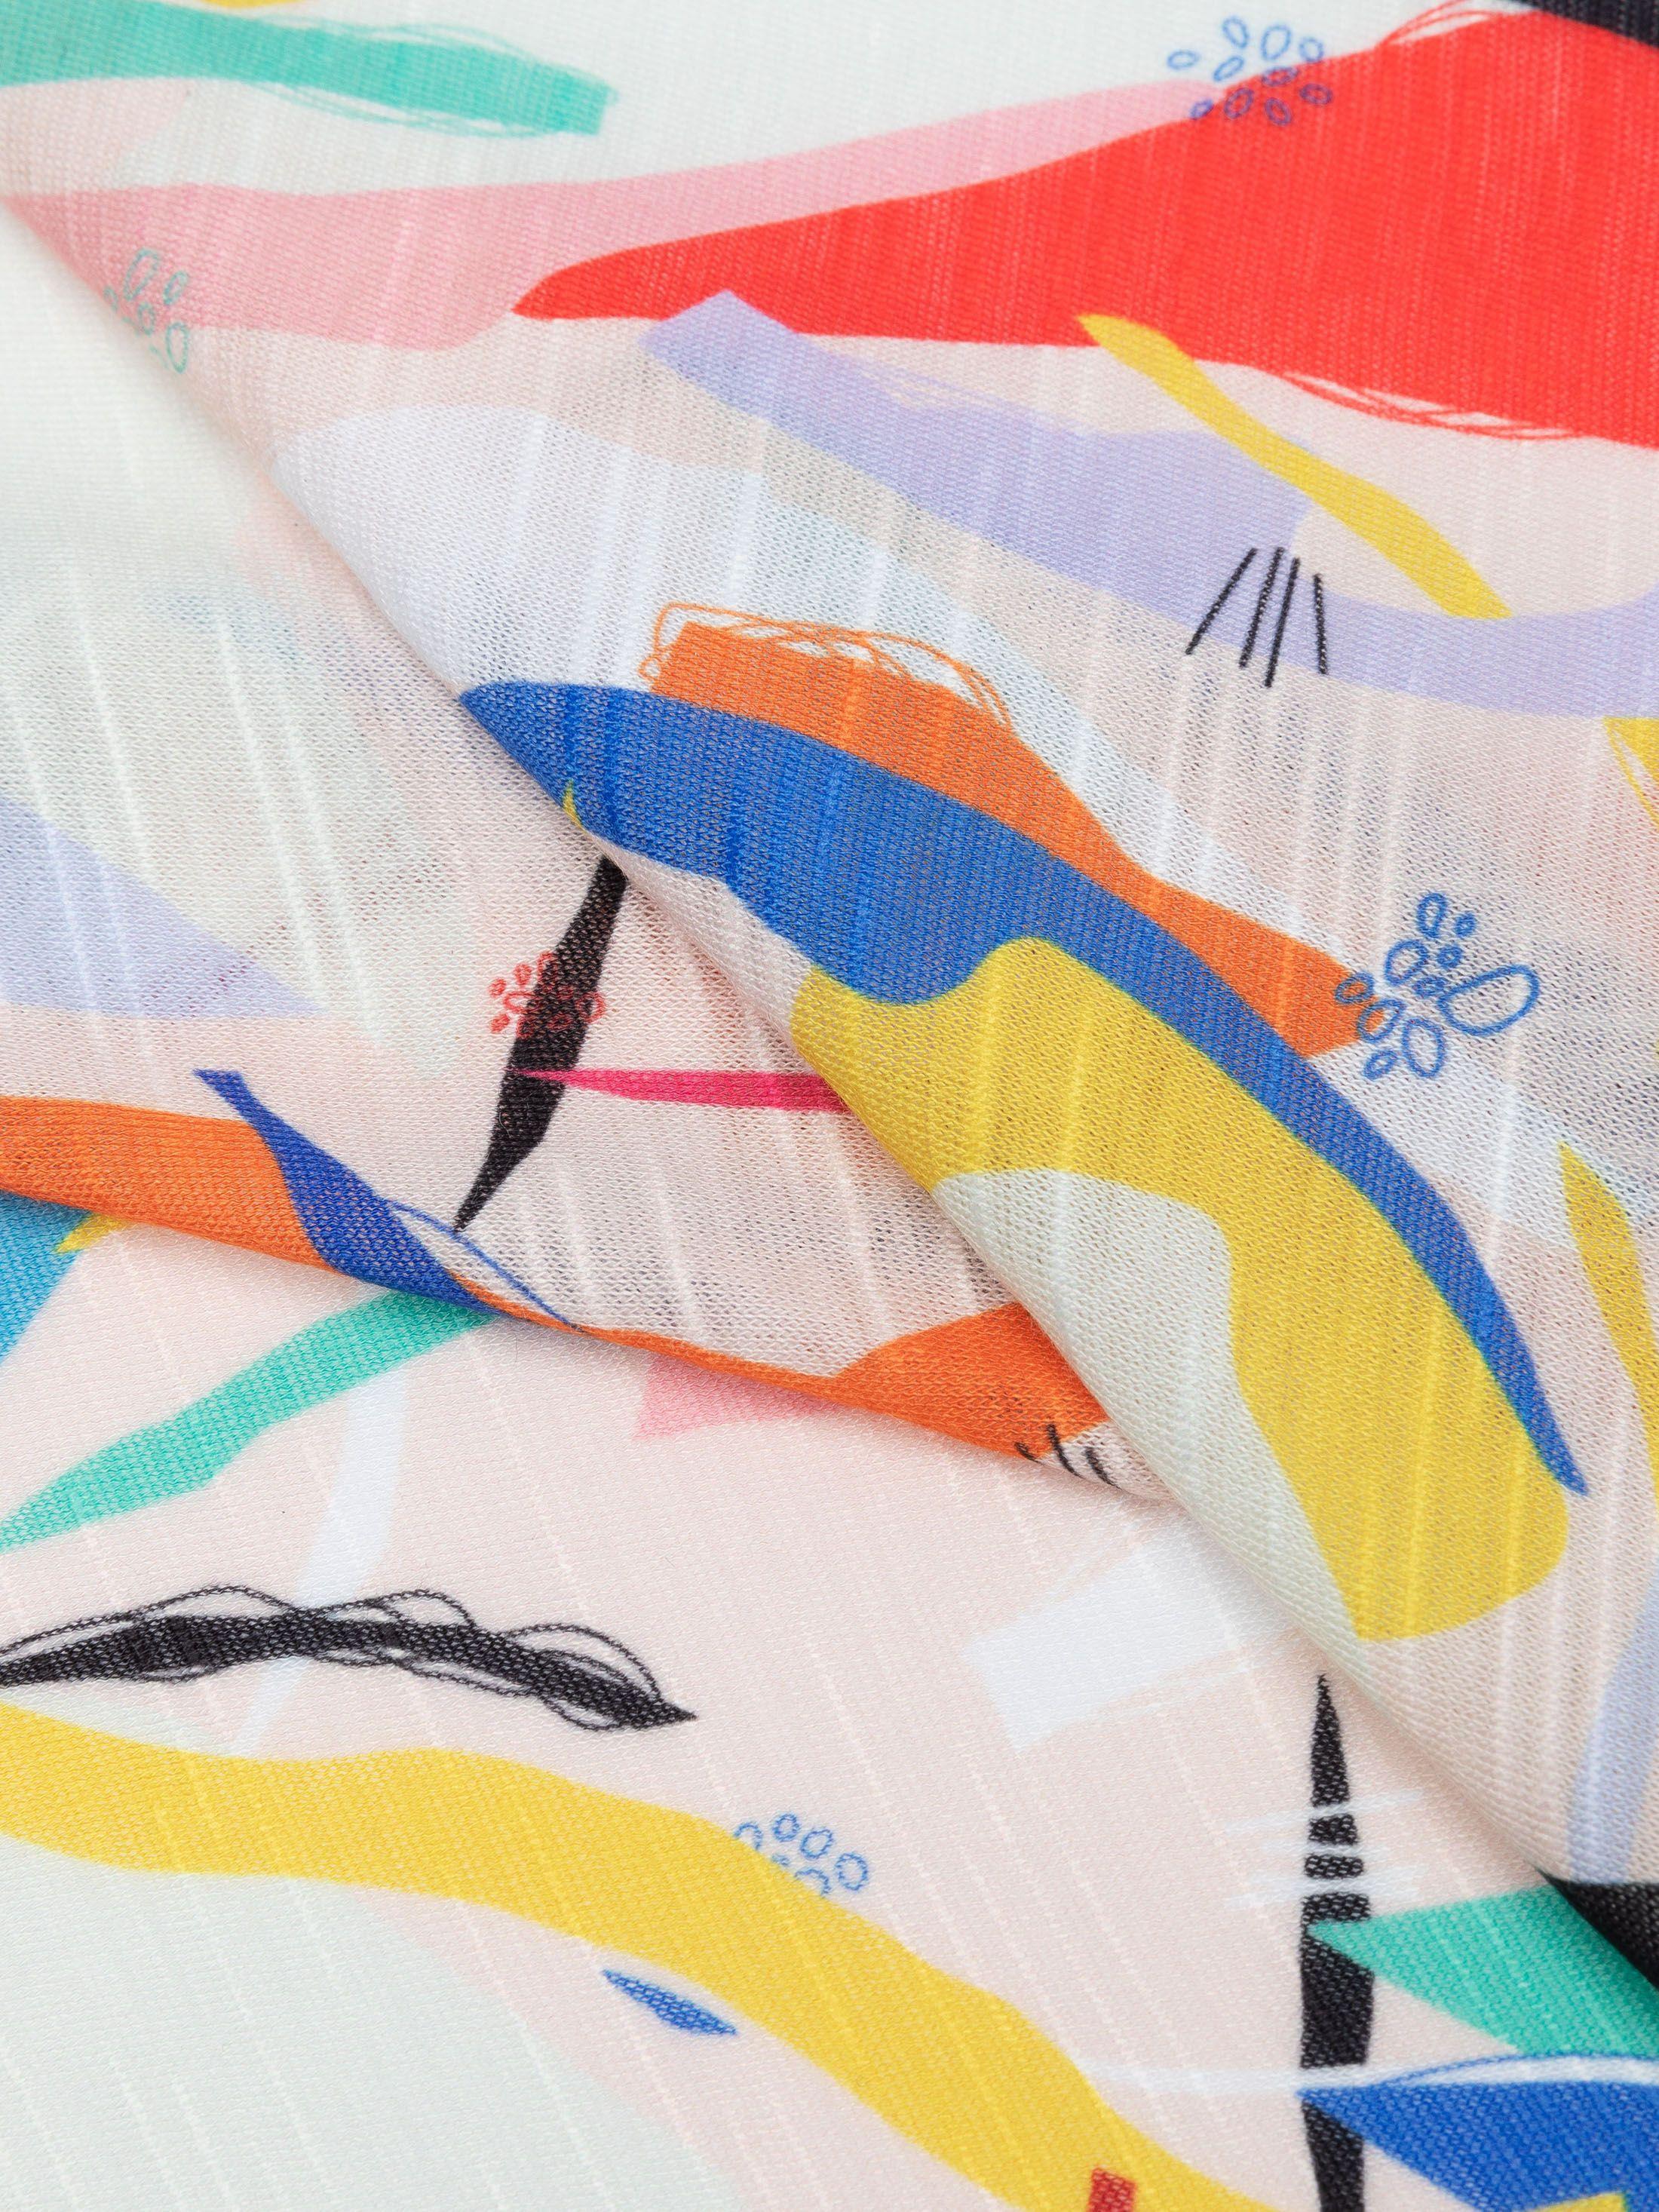 slub knit jersey fabric edge options